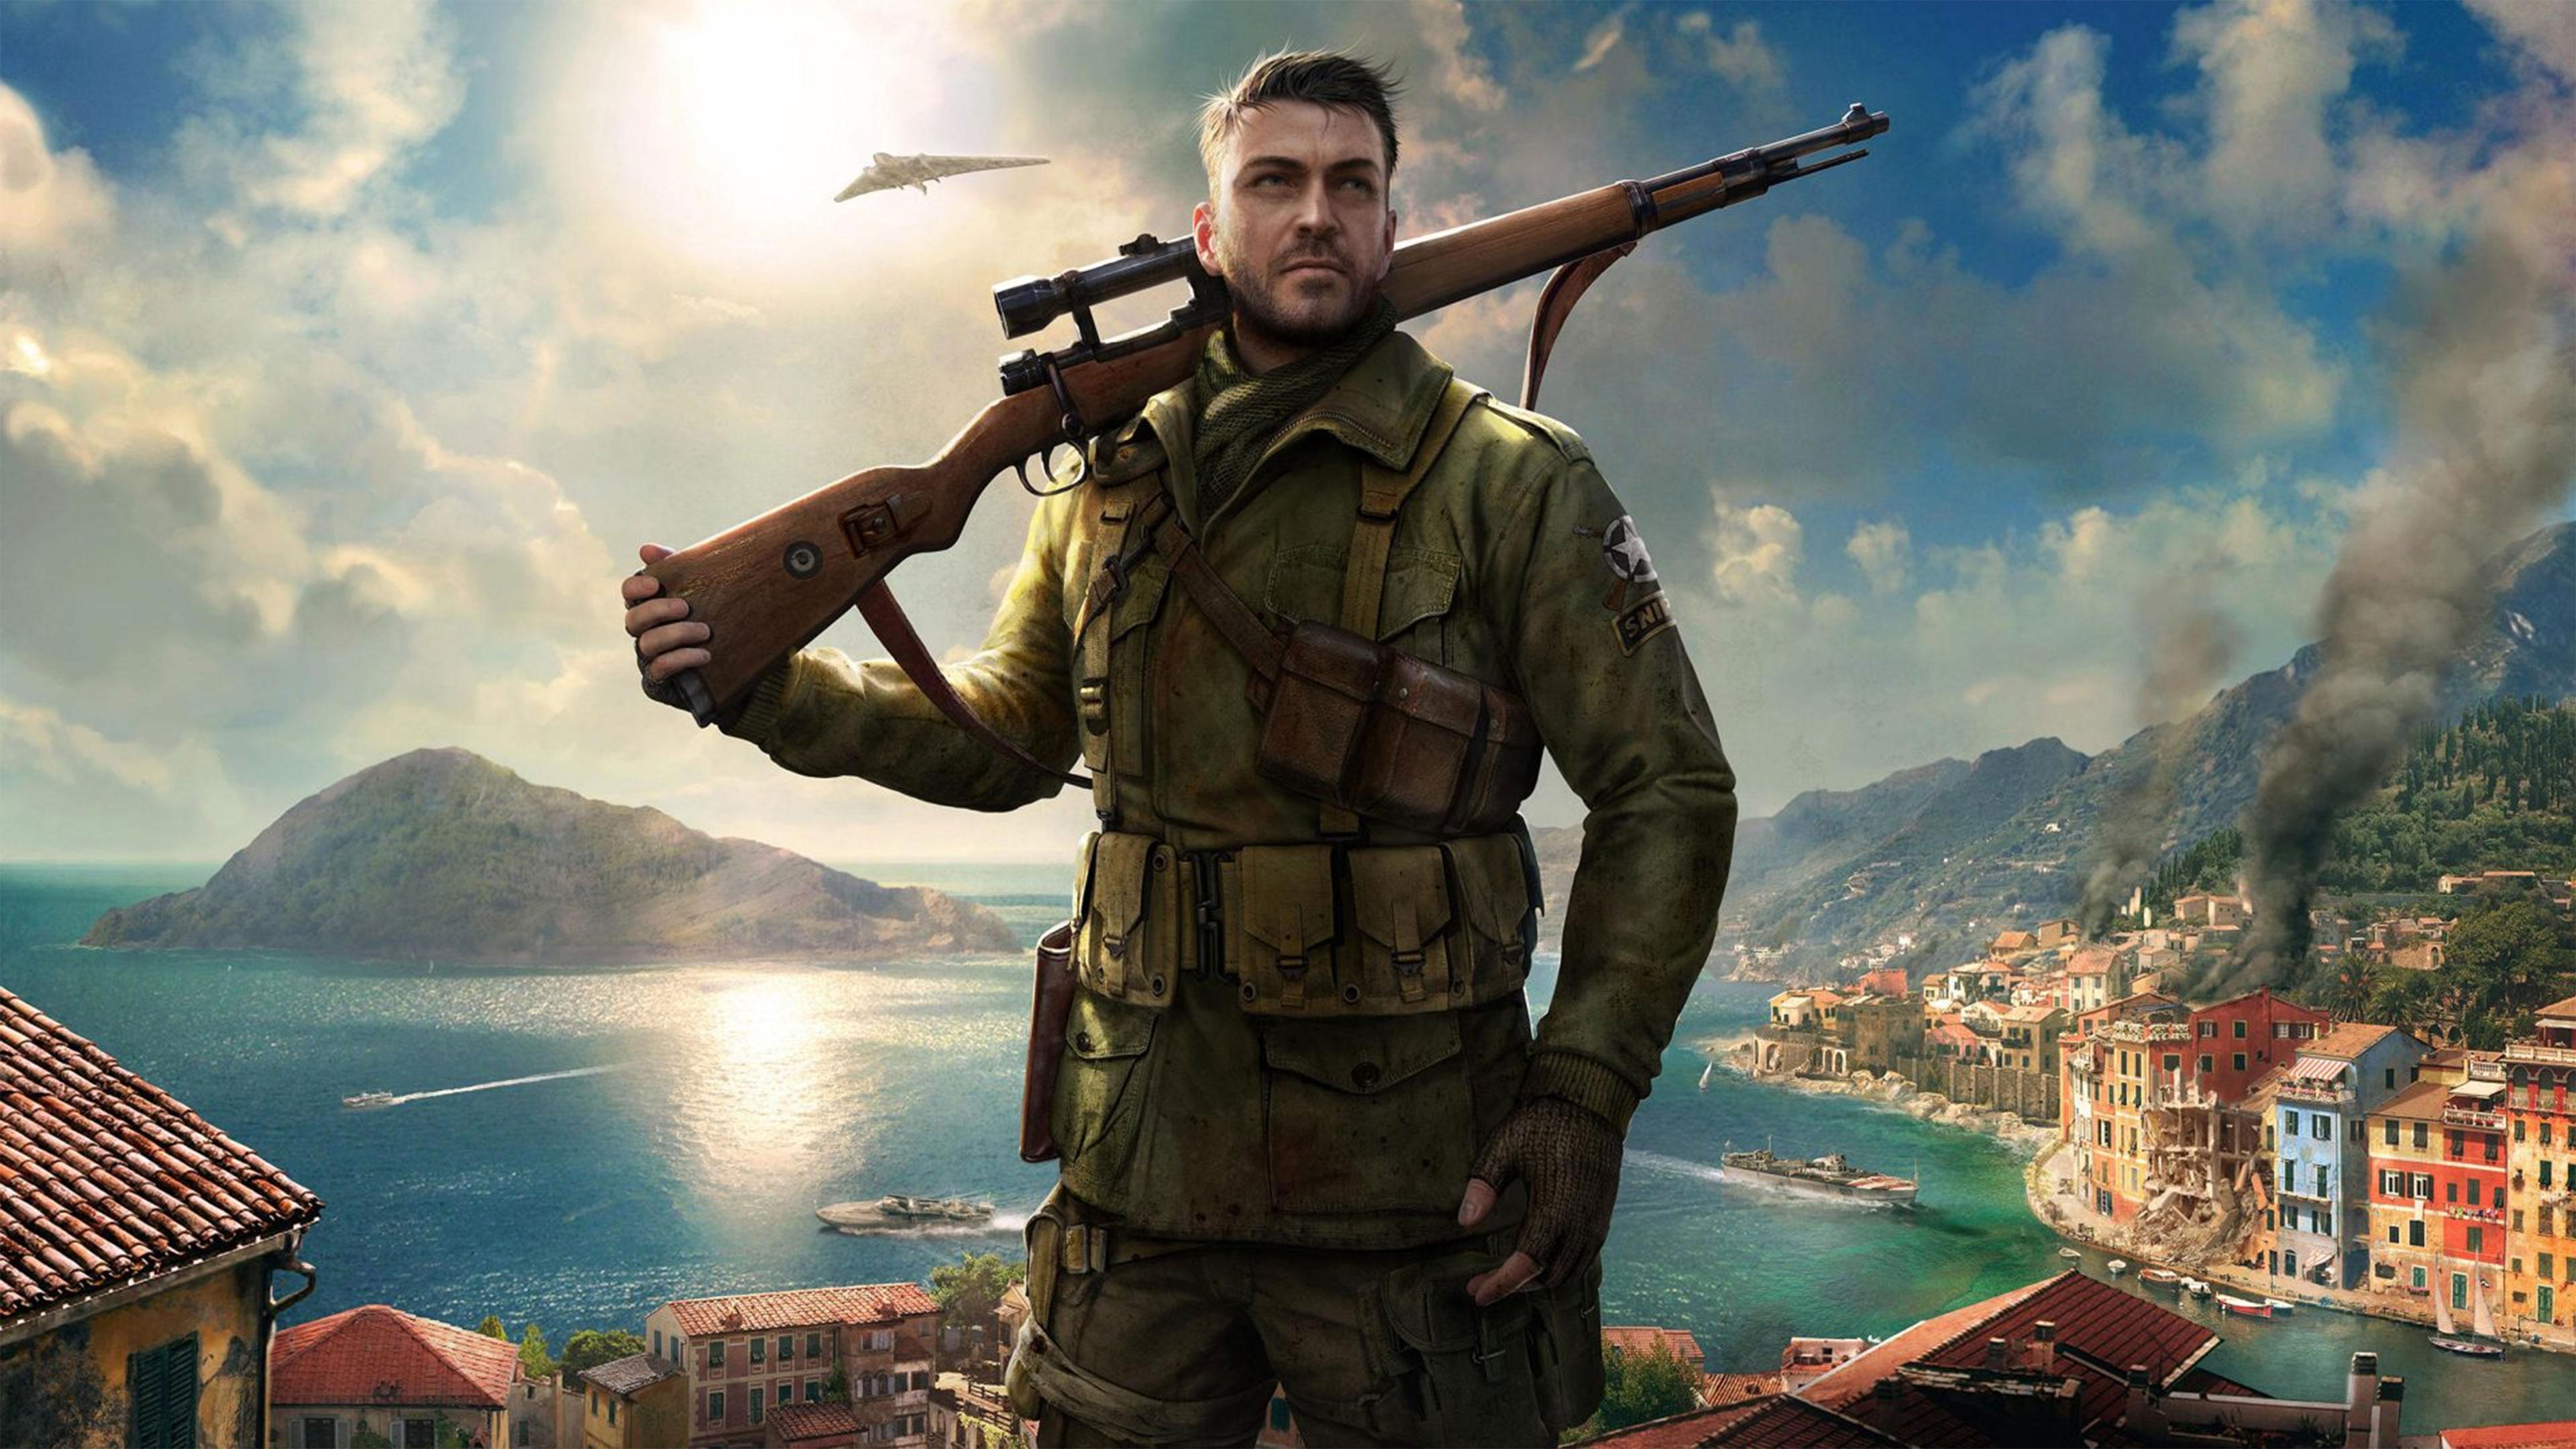 Sniper Elite 4 Wallpapers in Ultra HD 4K   Gameranx 3840x2160